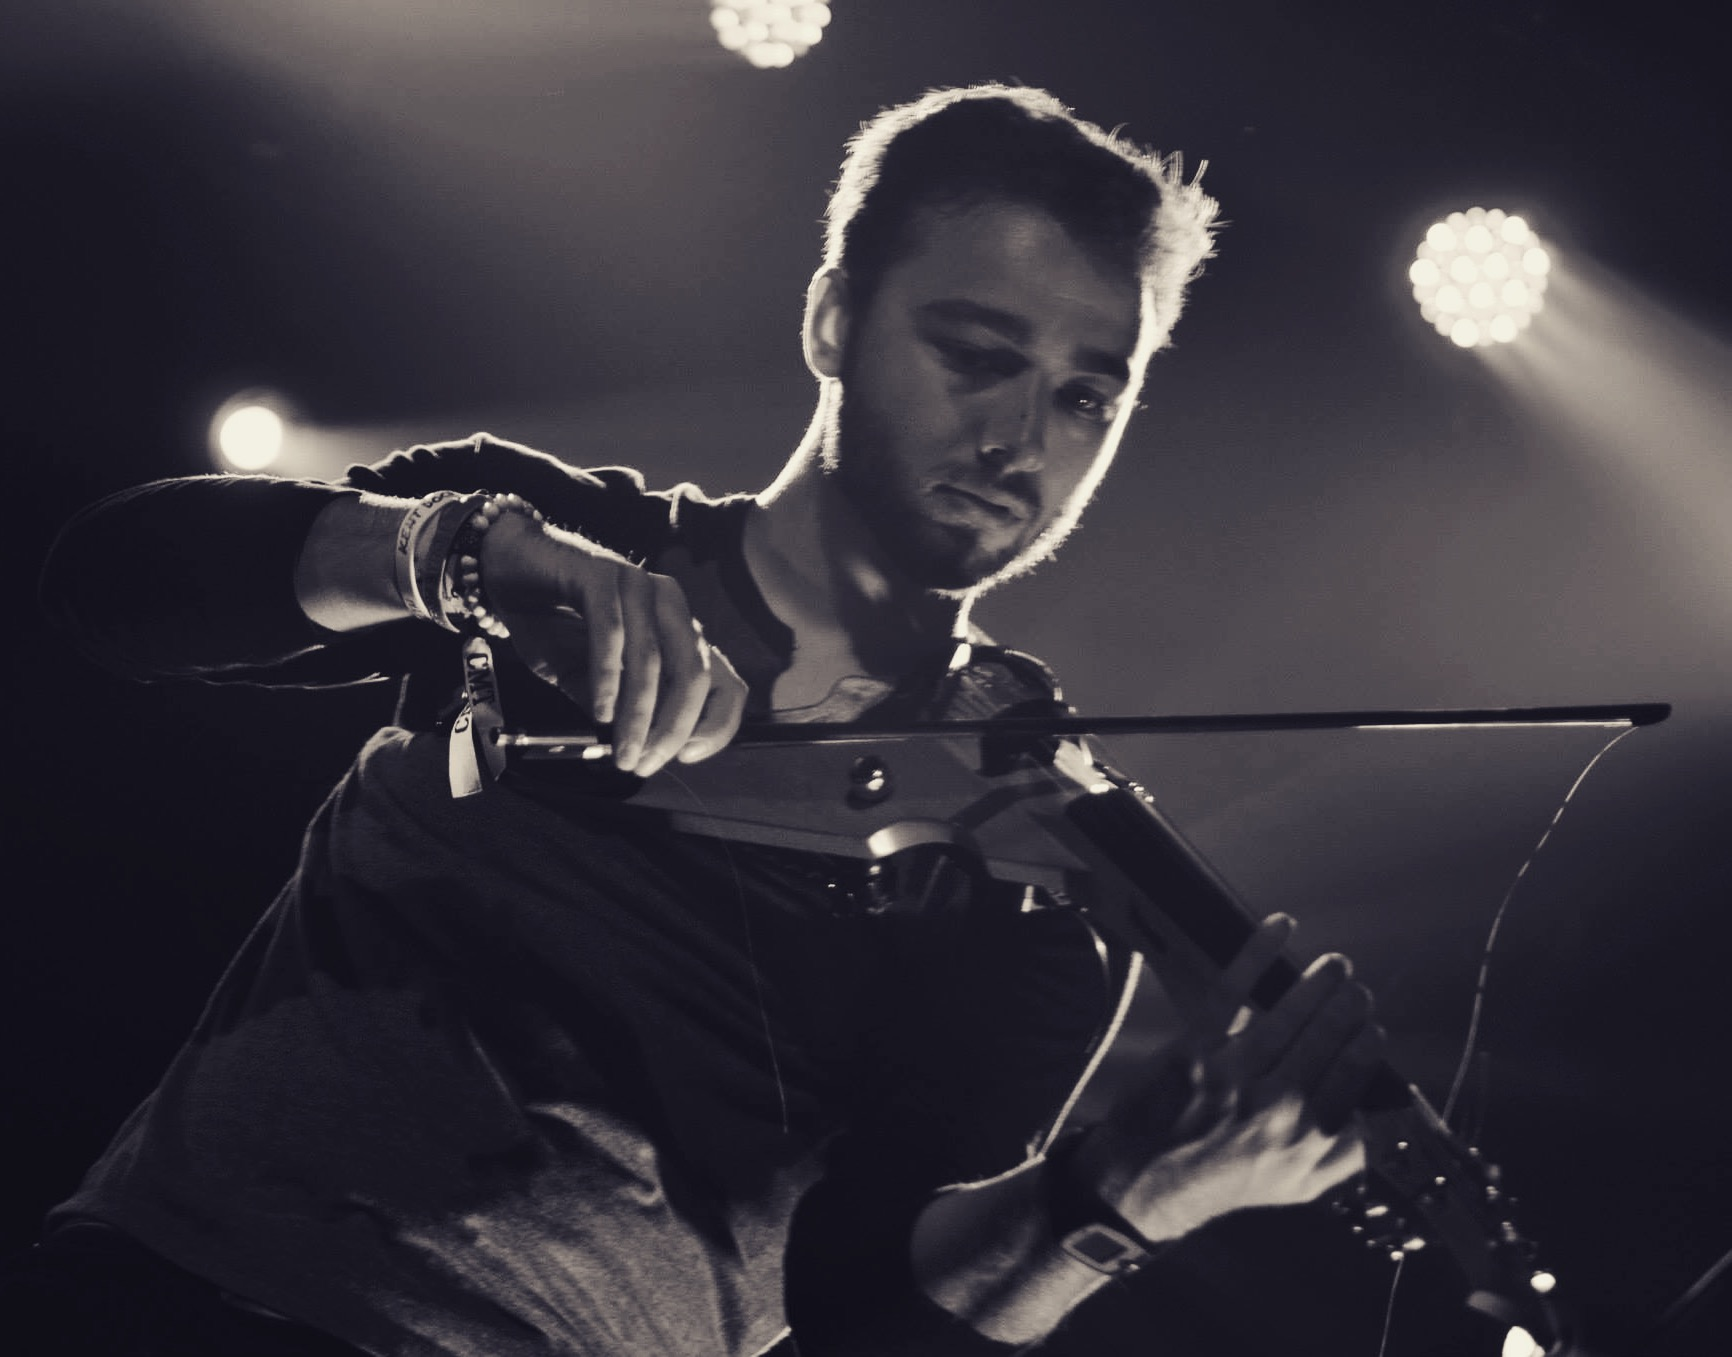 Hi! im kent dockus - Electric Violinist, Solo Artist, Music Education Advocate, Audio Engineer, Music Business Professional.Follow me on social media @KentDockusViolin